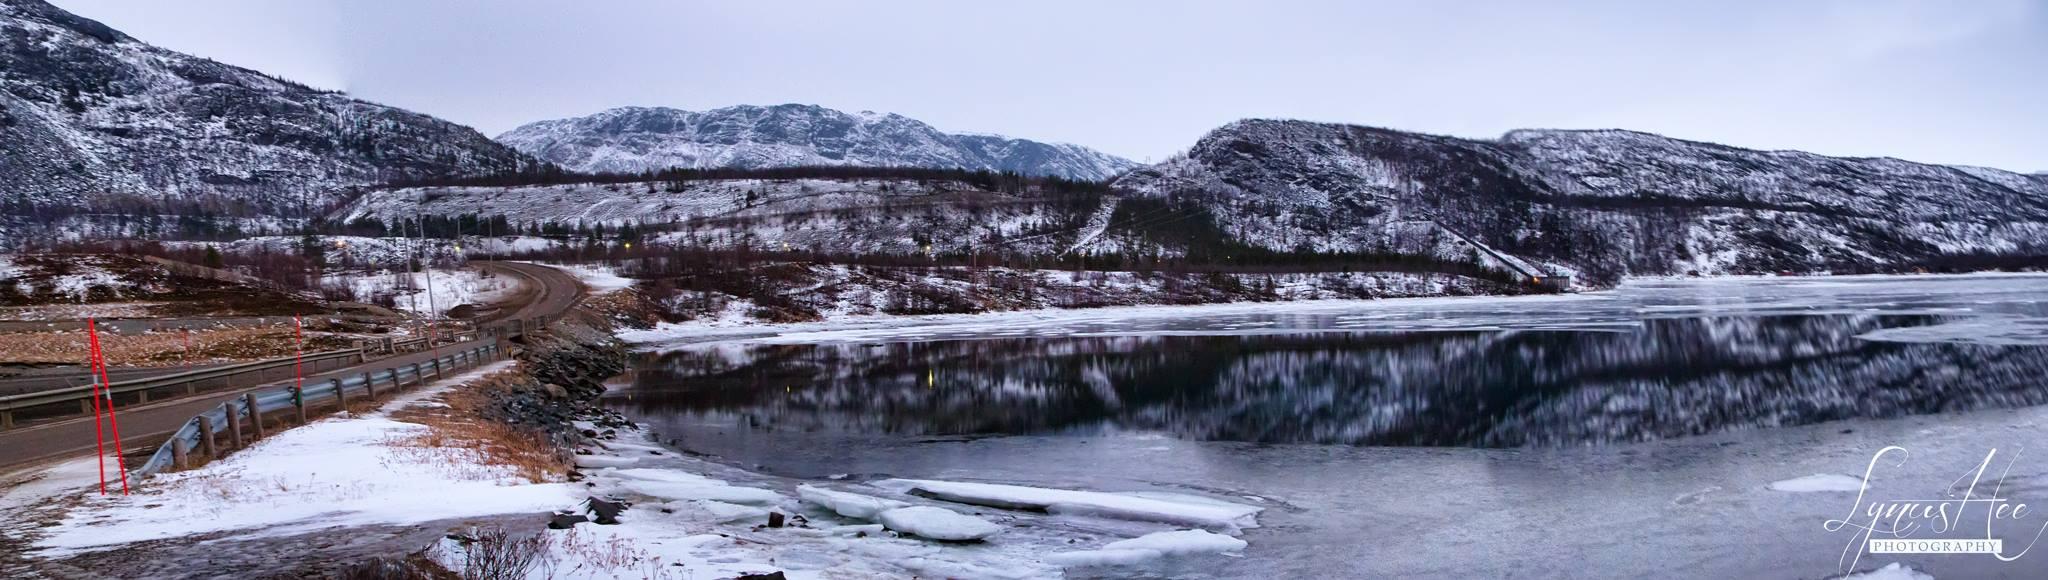 Fjord 2.jpg